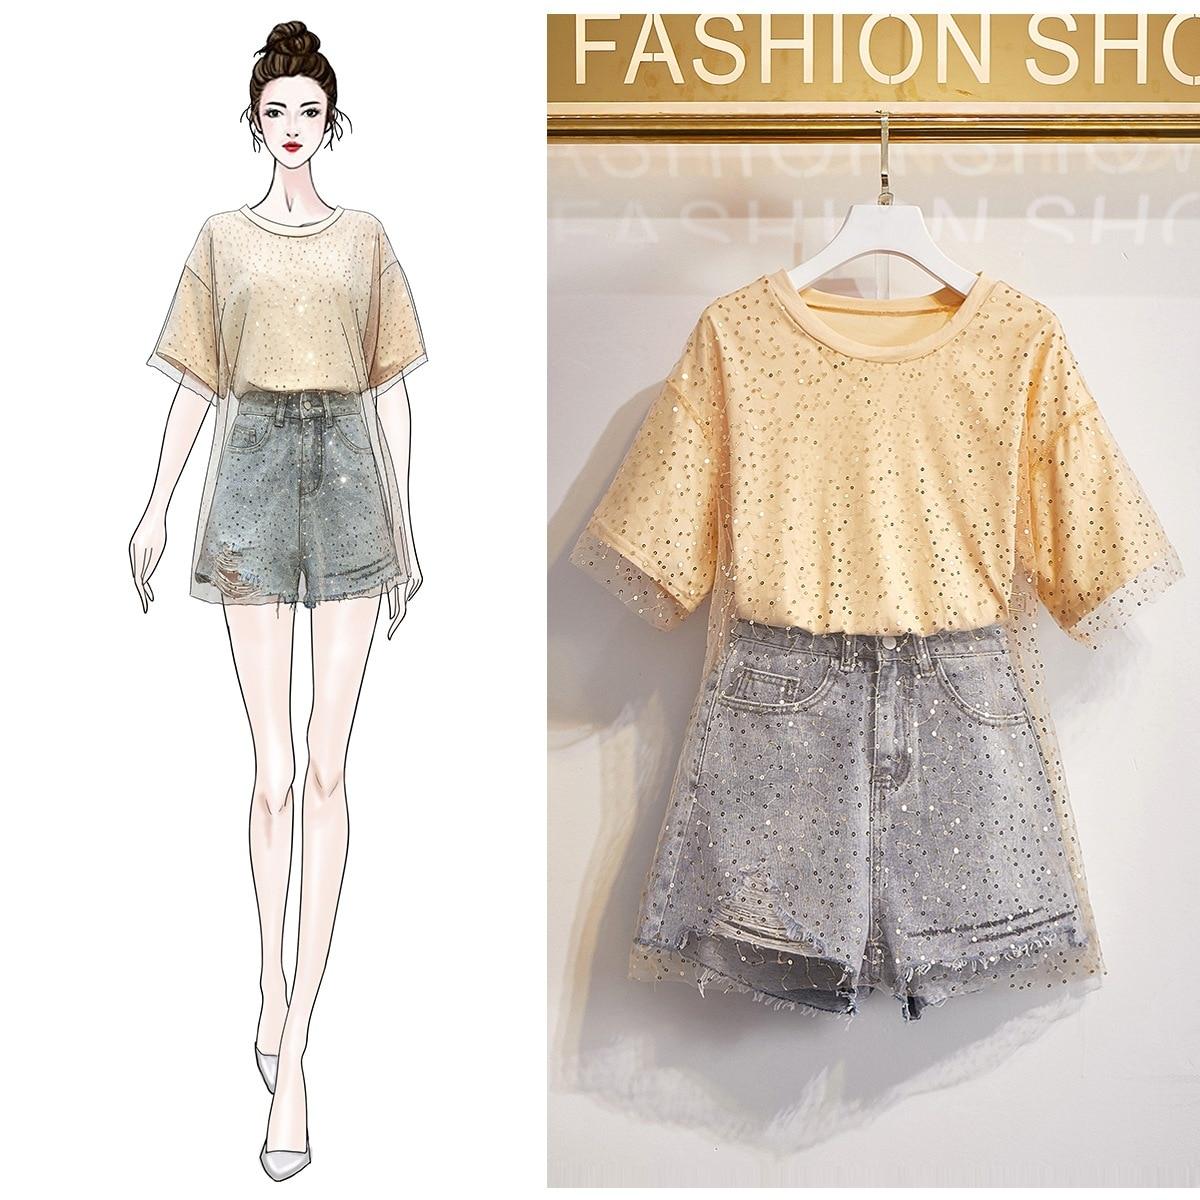 19 Sense Of Design Flashing Sequin Gauze T-shirt Double Layer Hollow Out Tops + High-waisted Versatile Denim Shorts Wide-Leg Sho